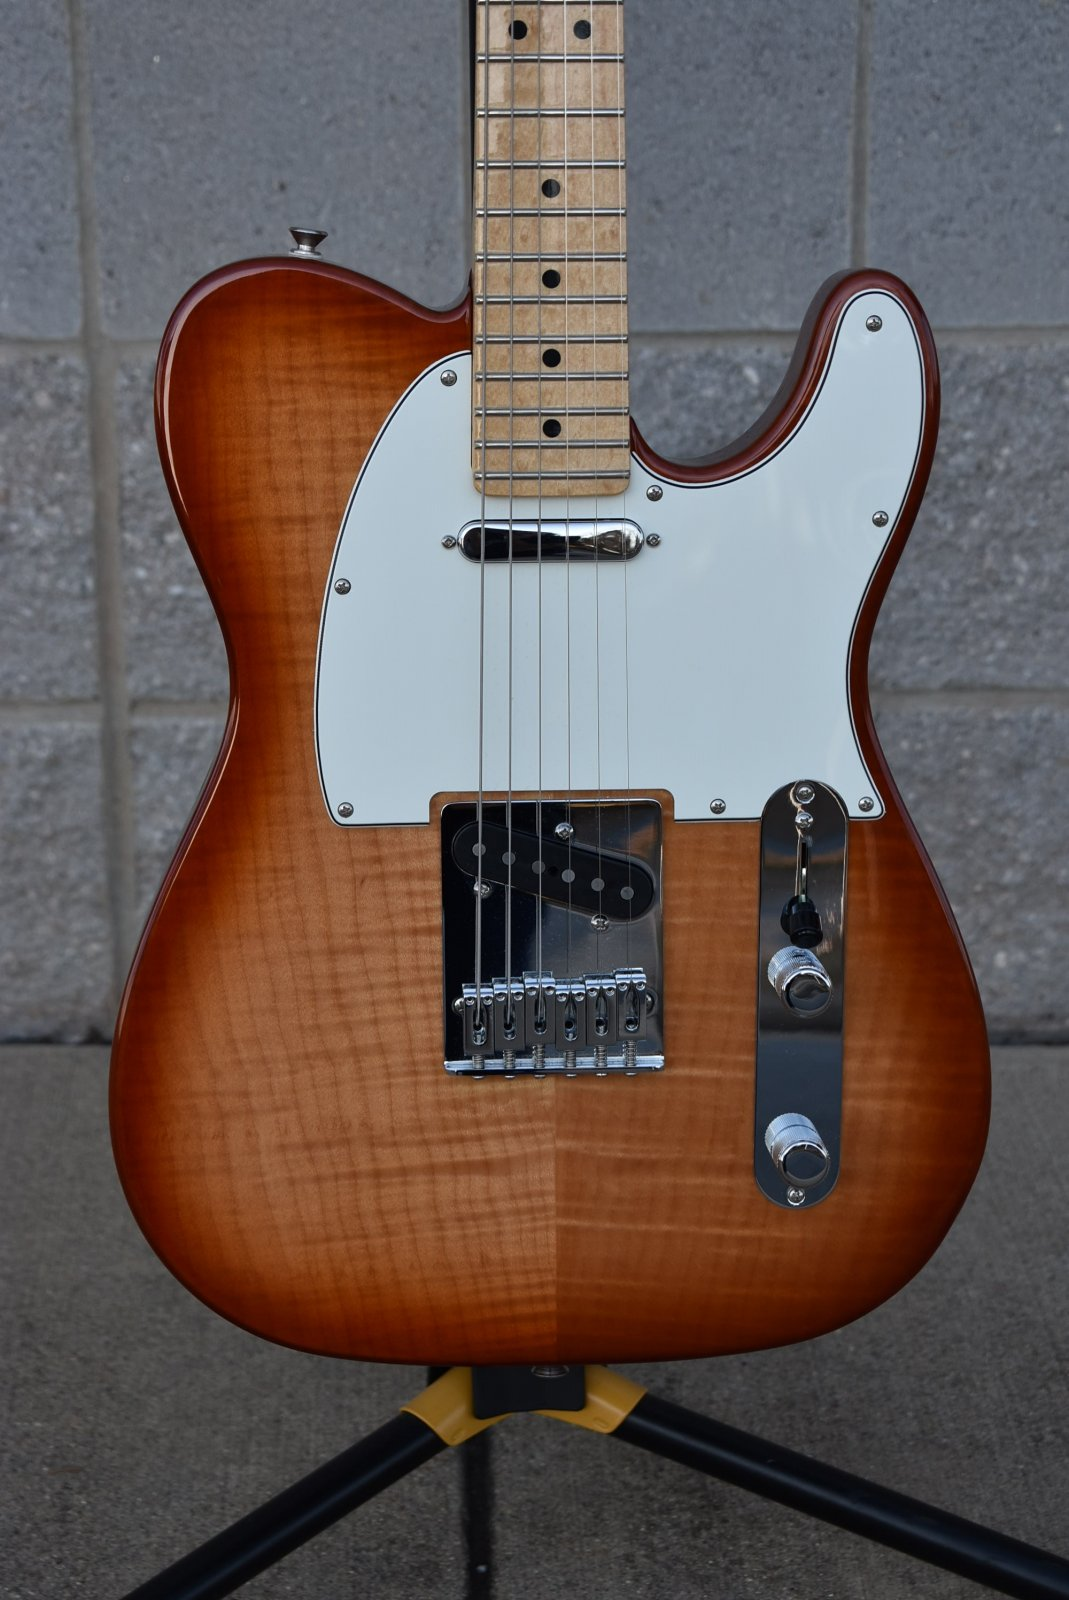 2020 Fender Ltd Player Plus Top Telecaster